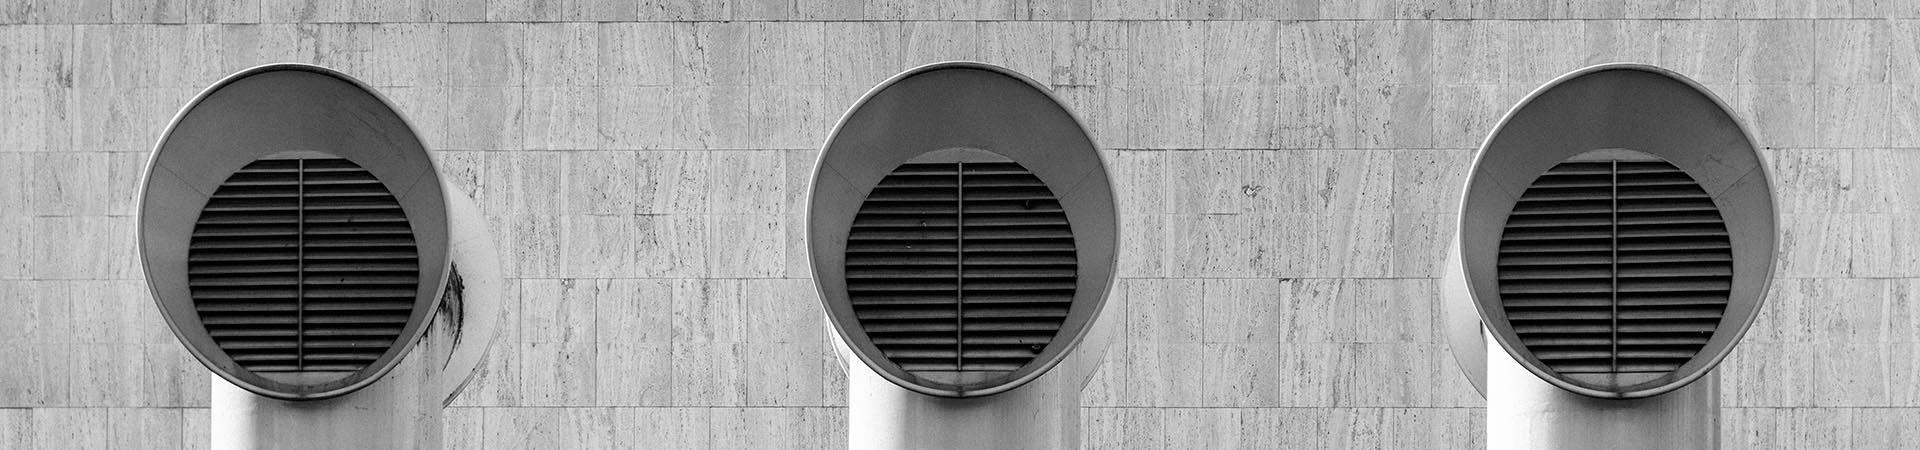 proper-building-ventilation